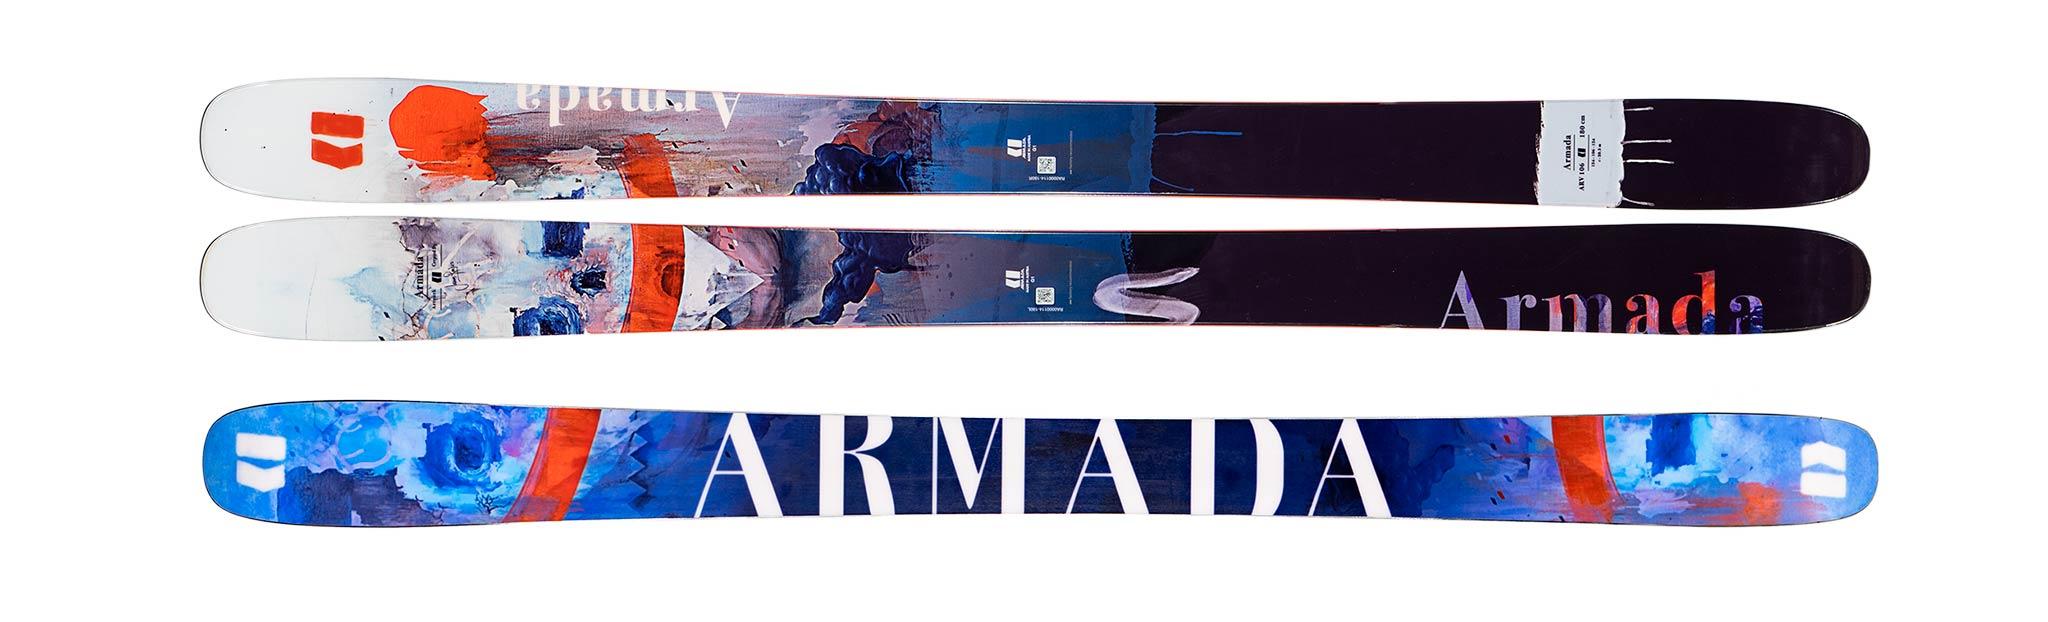 "Kaufberatung Freestyle Ski 2019/2020: Armada ""ARV 106"": Topsheet & Base"